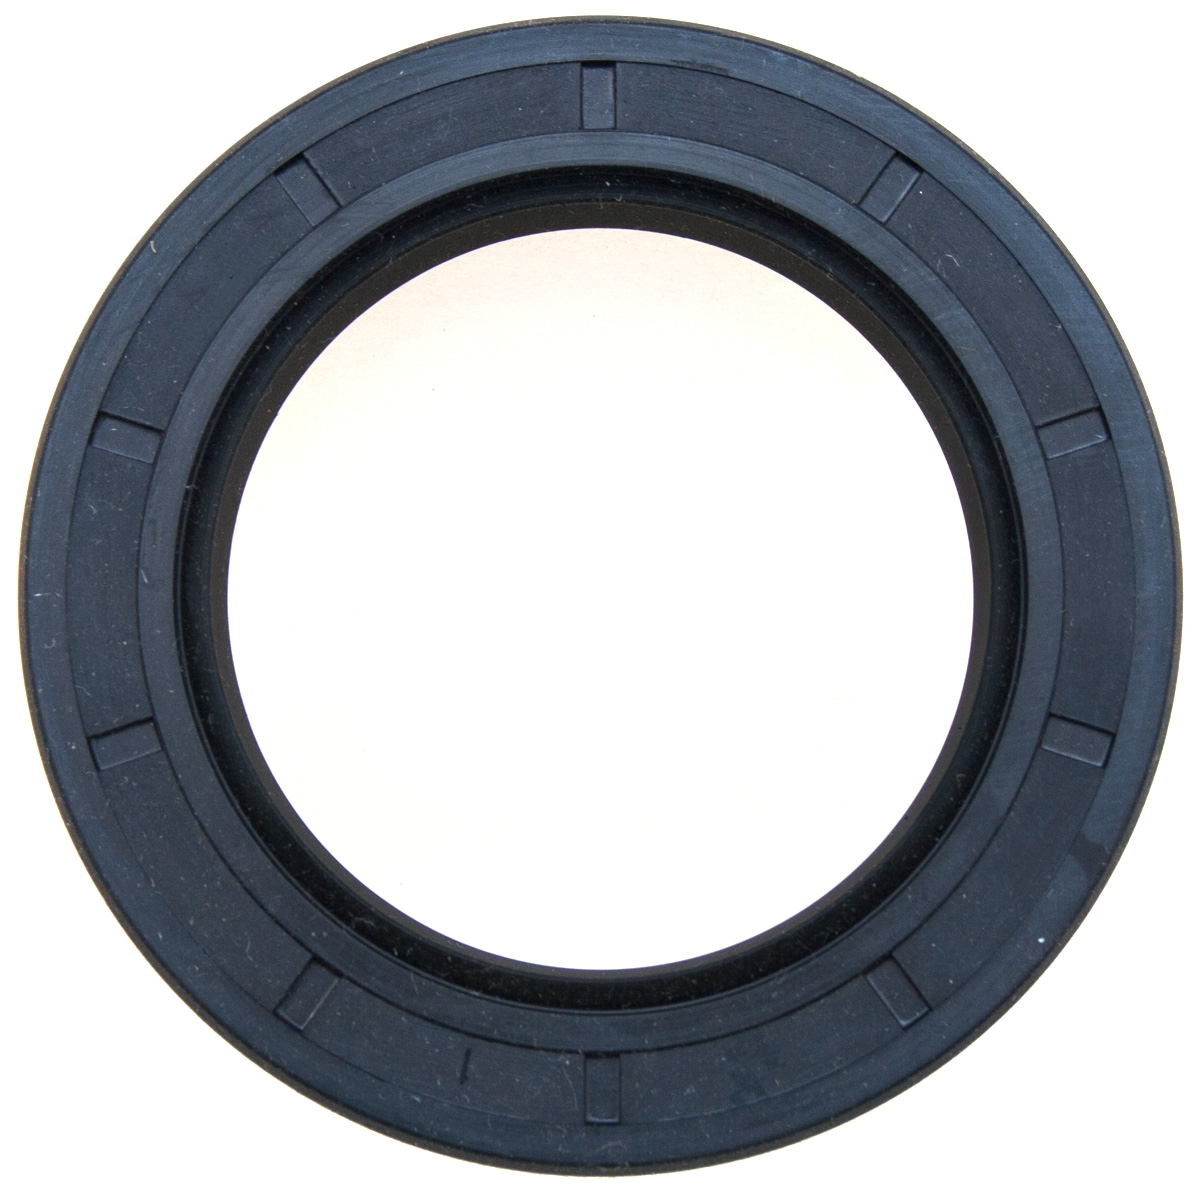 1 Radial-Wellendichtring 30 x 62 x 8 mm DASL NBR 70